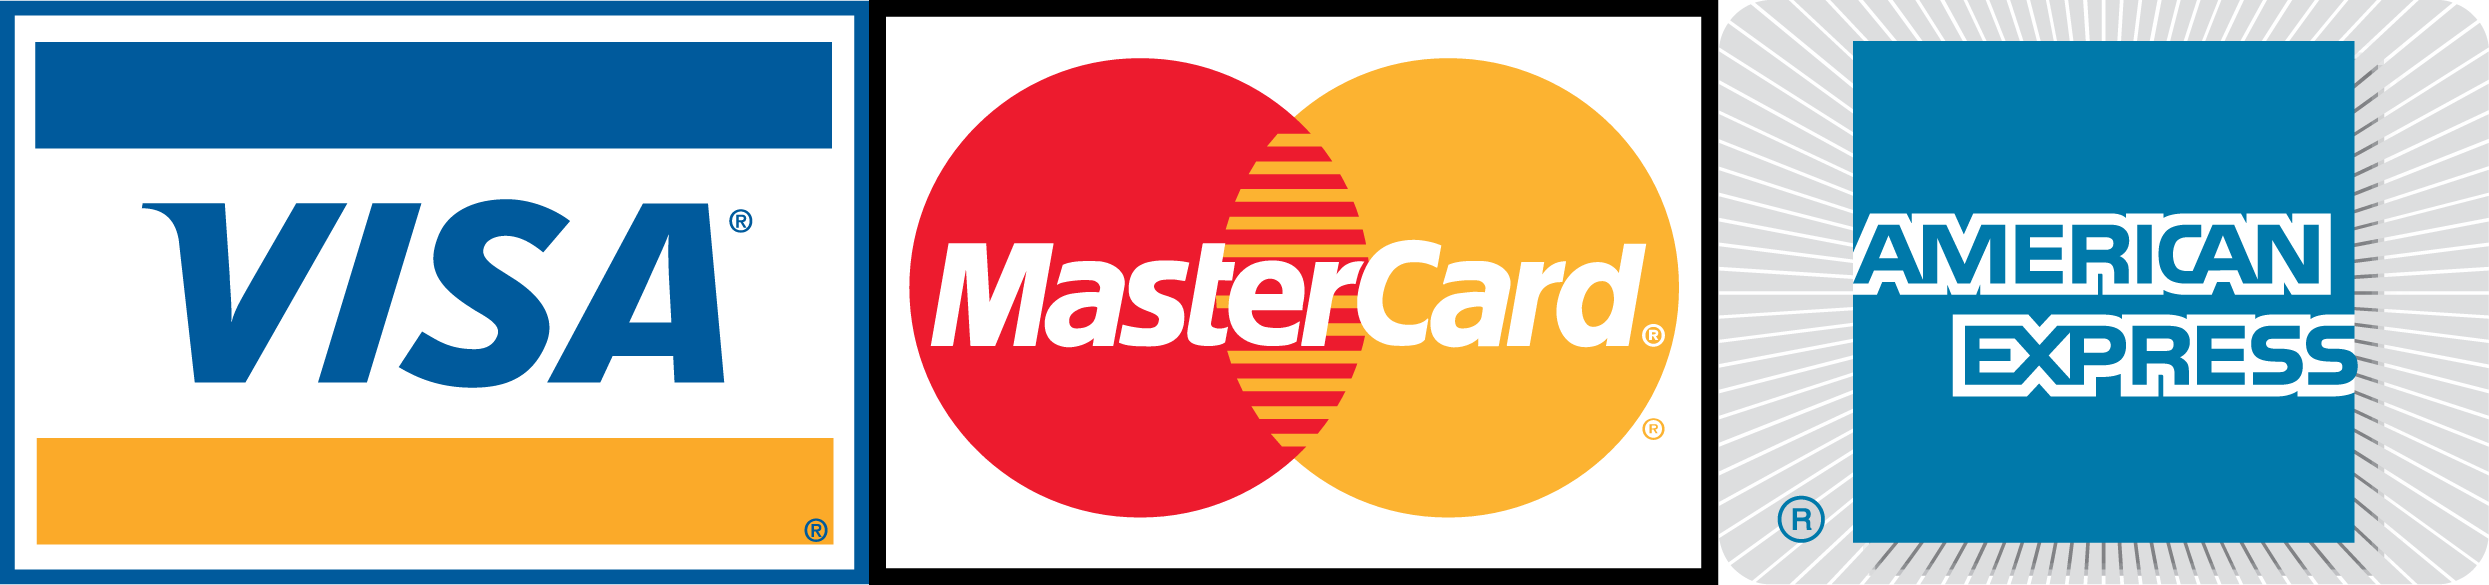 Credit-Card-Visa-And-Master-Card-Transparent-Background.png